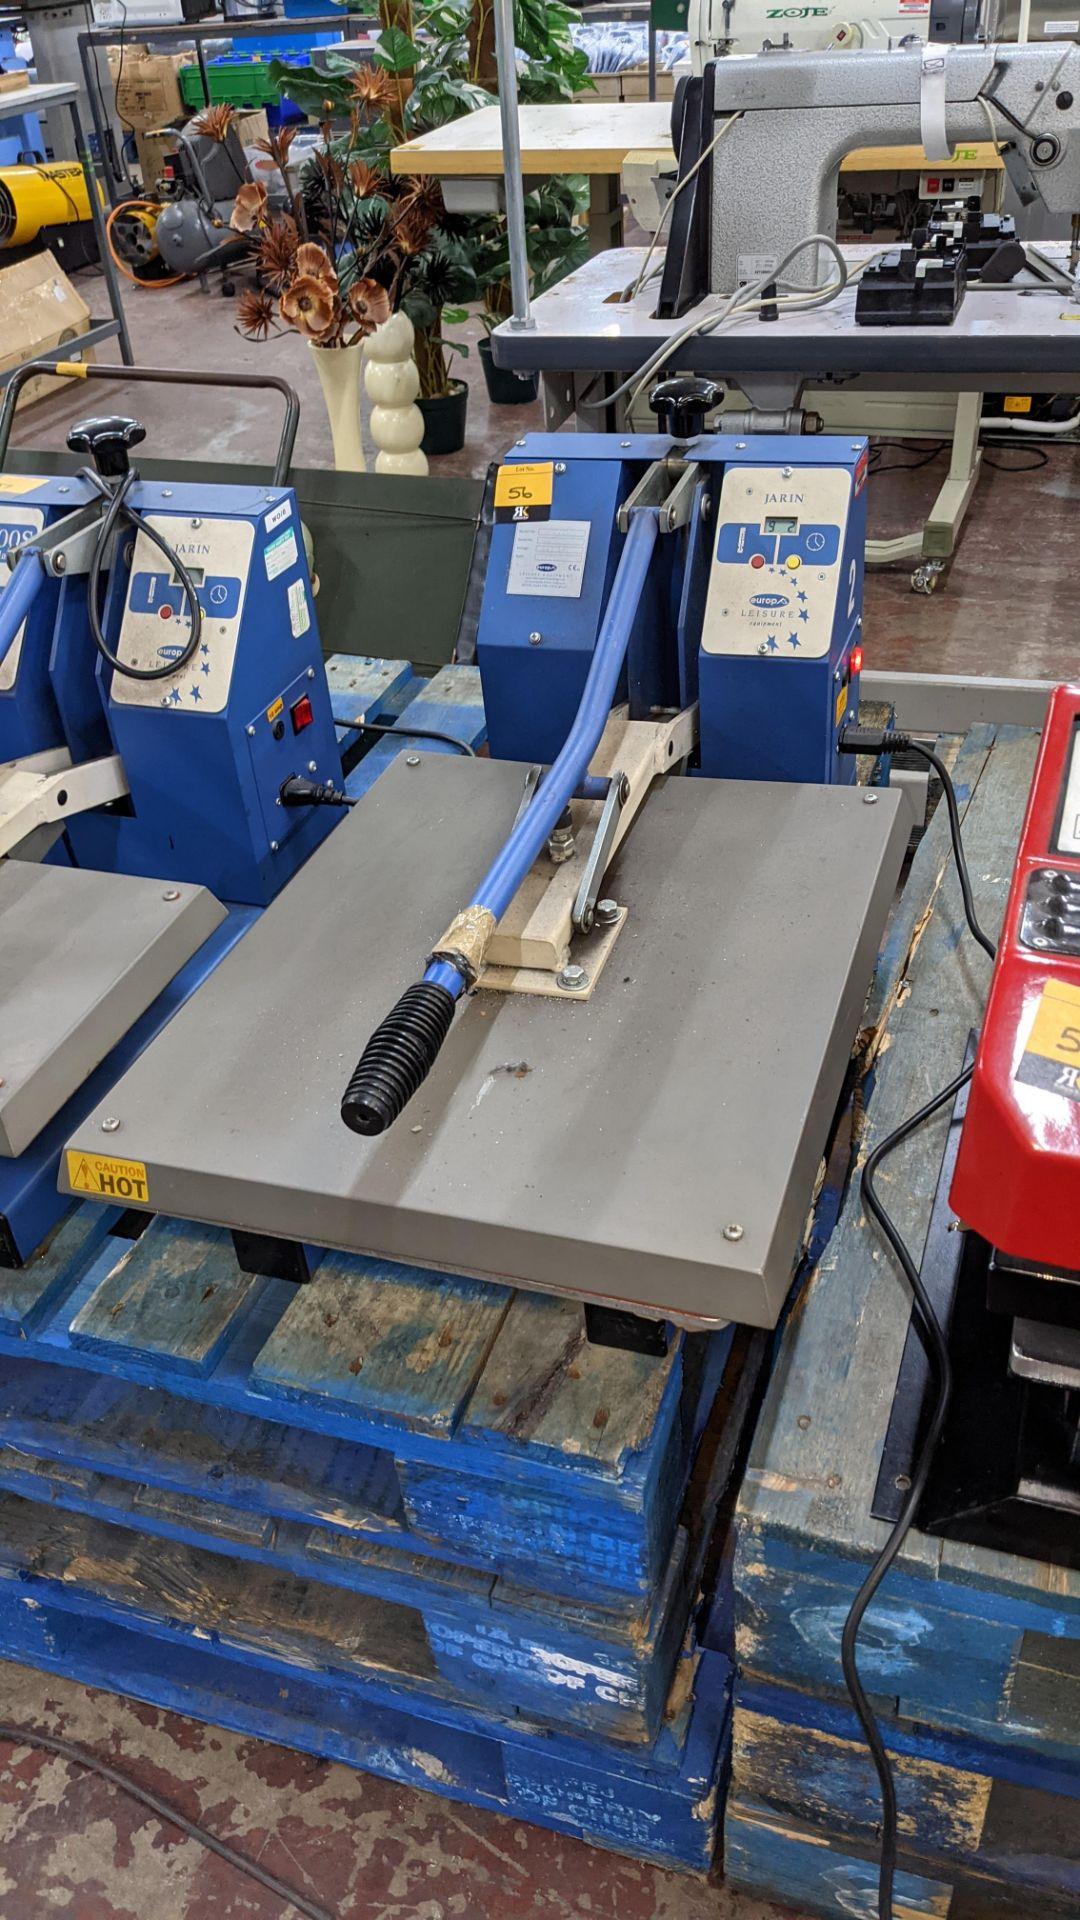 Europa Jarin benchtop heat transfer press model HF5000 - Image 2 of 13